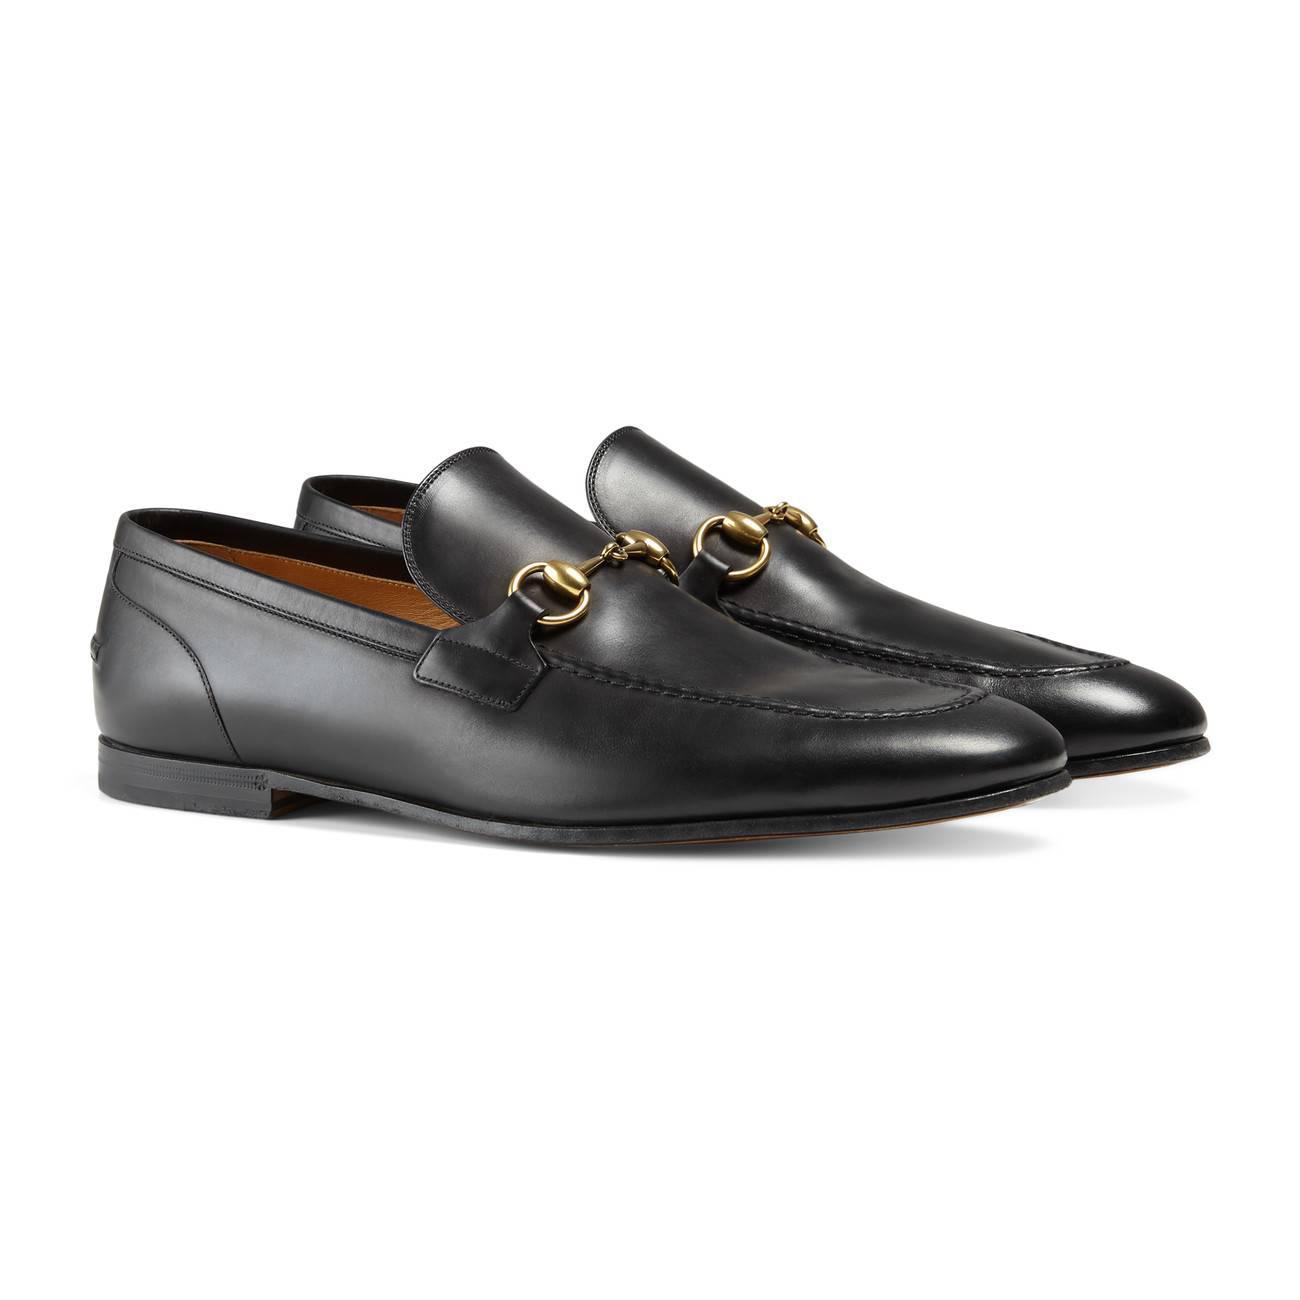 cadb3d574e8 Gucci - Black Jordaan Leather Loafer for Men - Lyst. View fullscreen